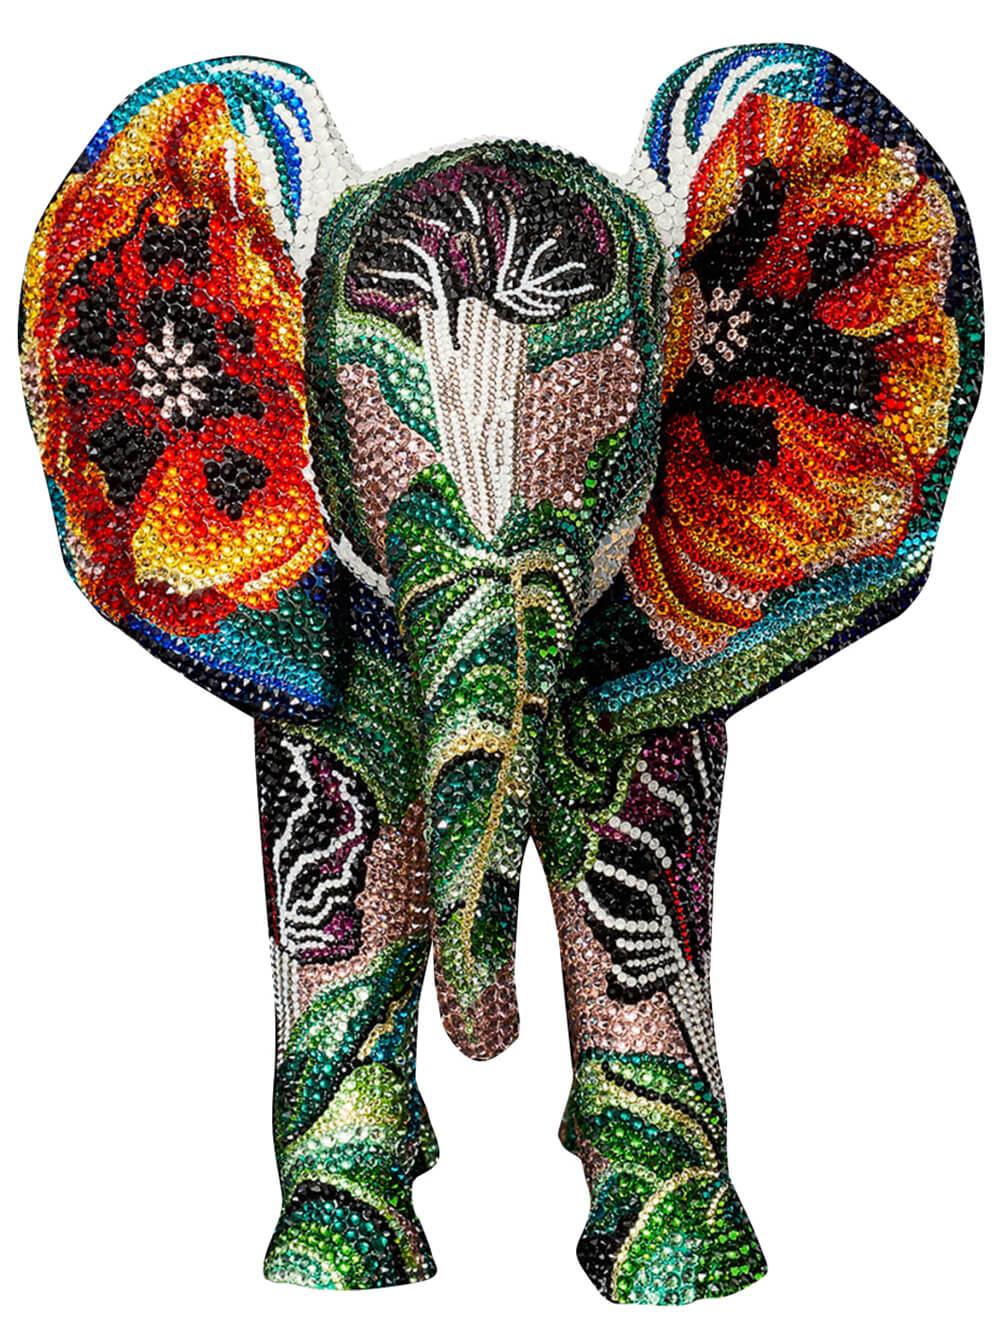 Elephant Burning Desire - Metis Atash -Emerging Artists